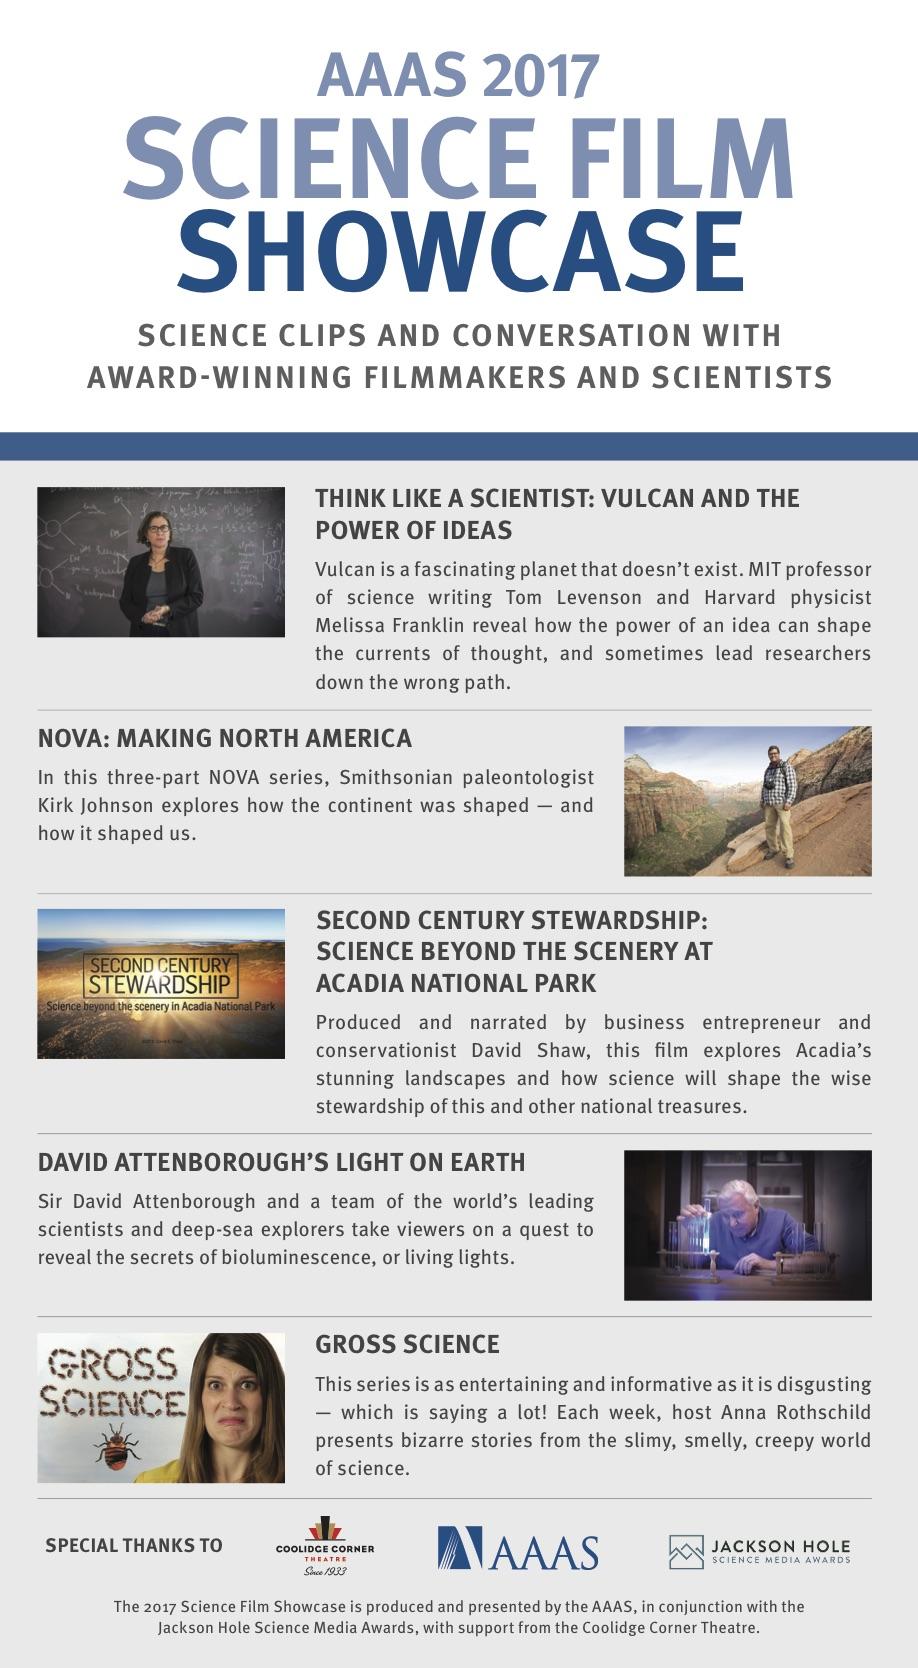 AAAS 2017 Science Film Showcase Flyer